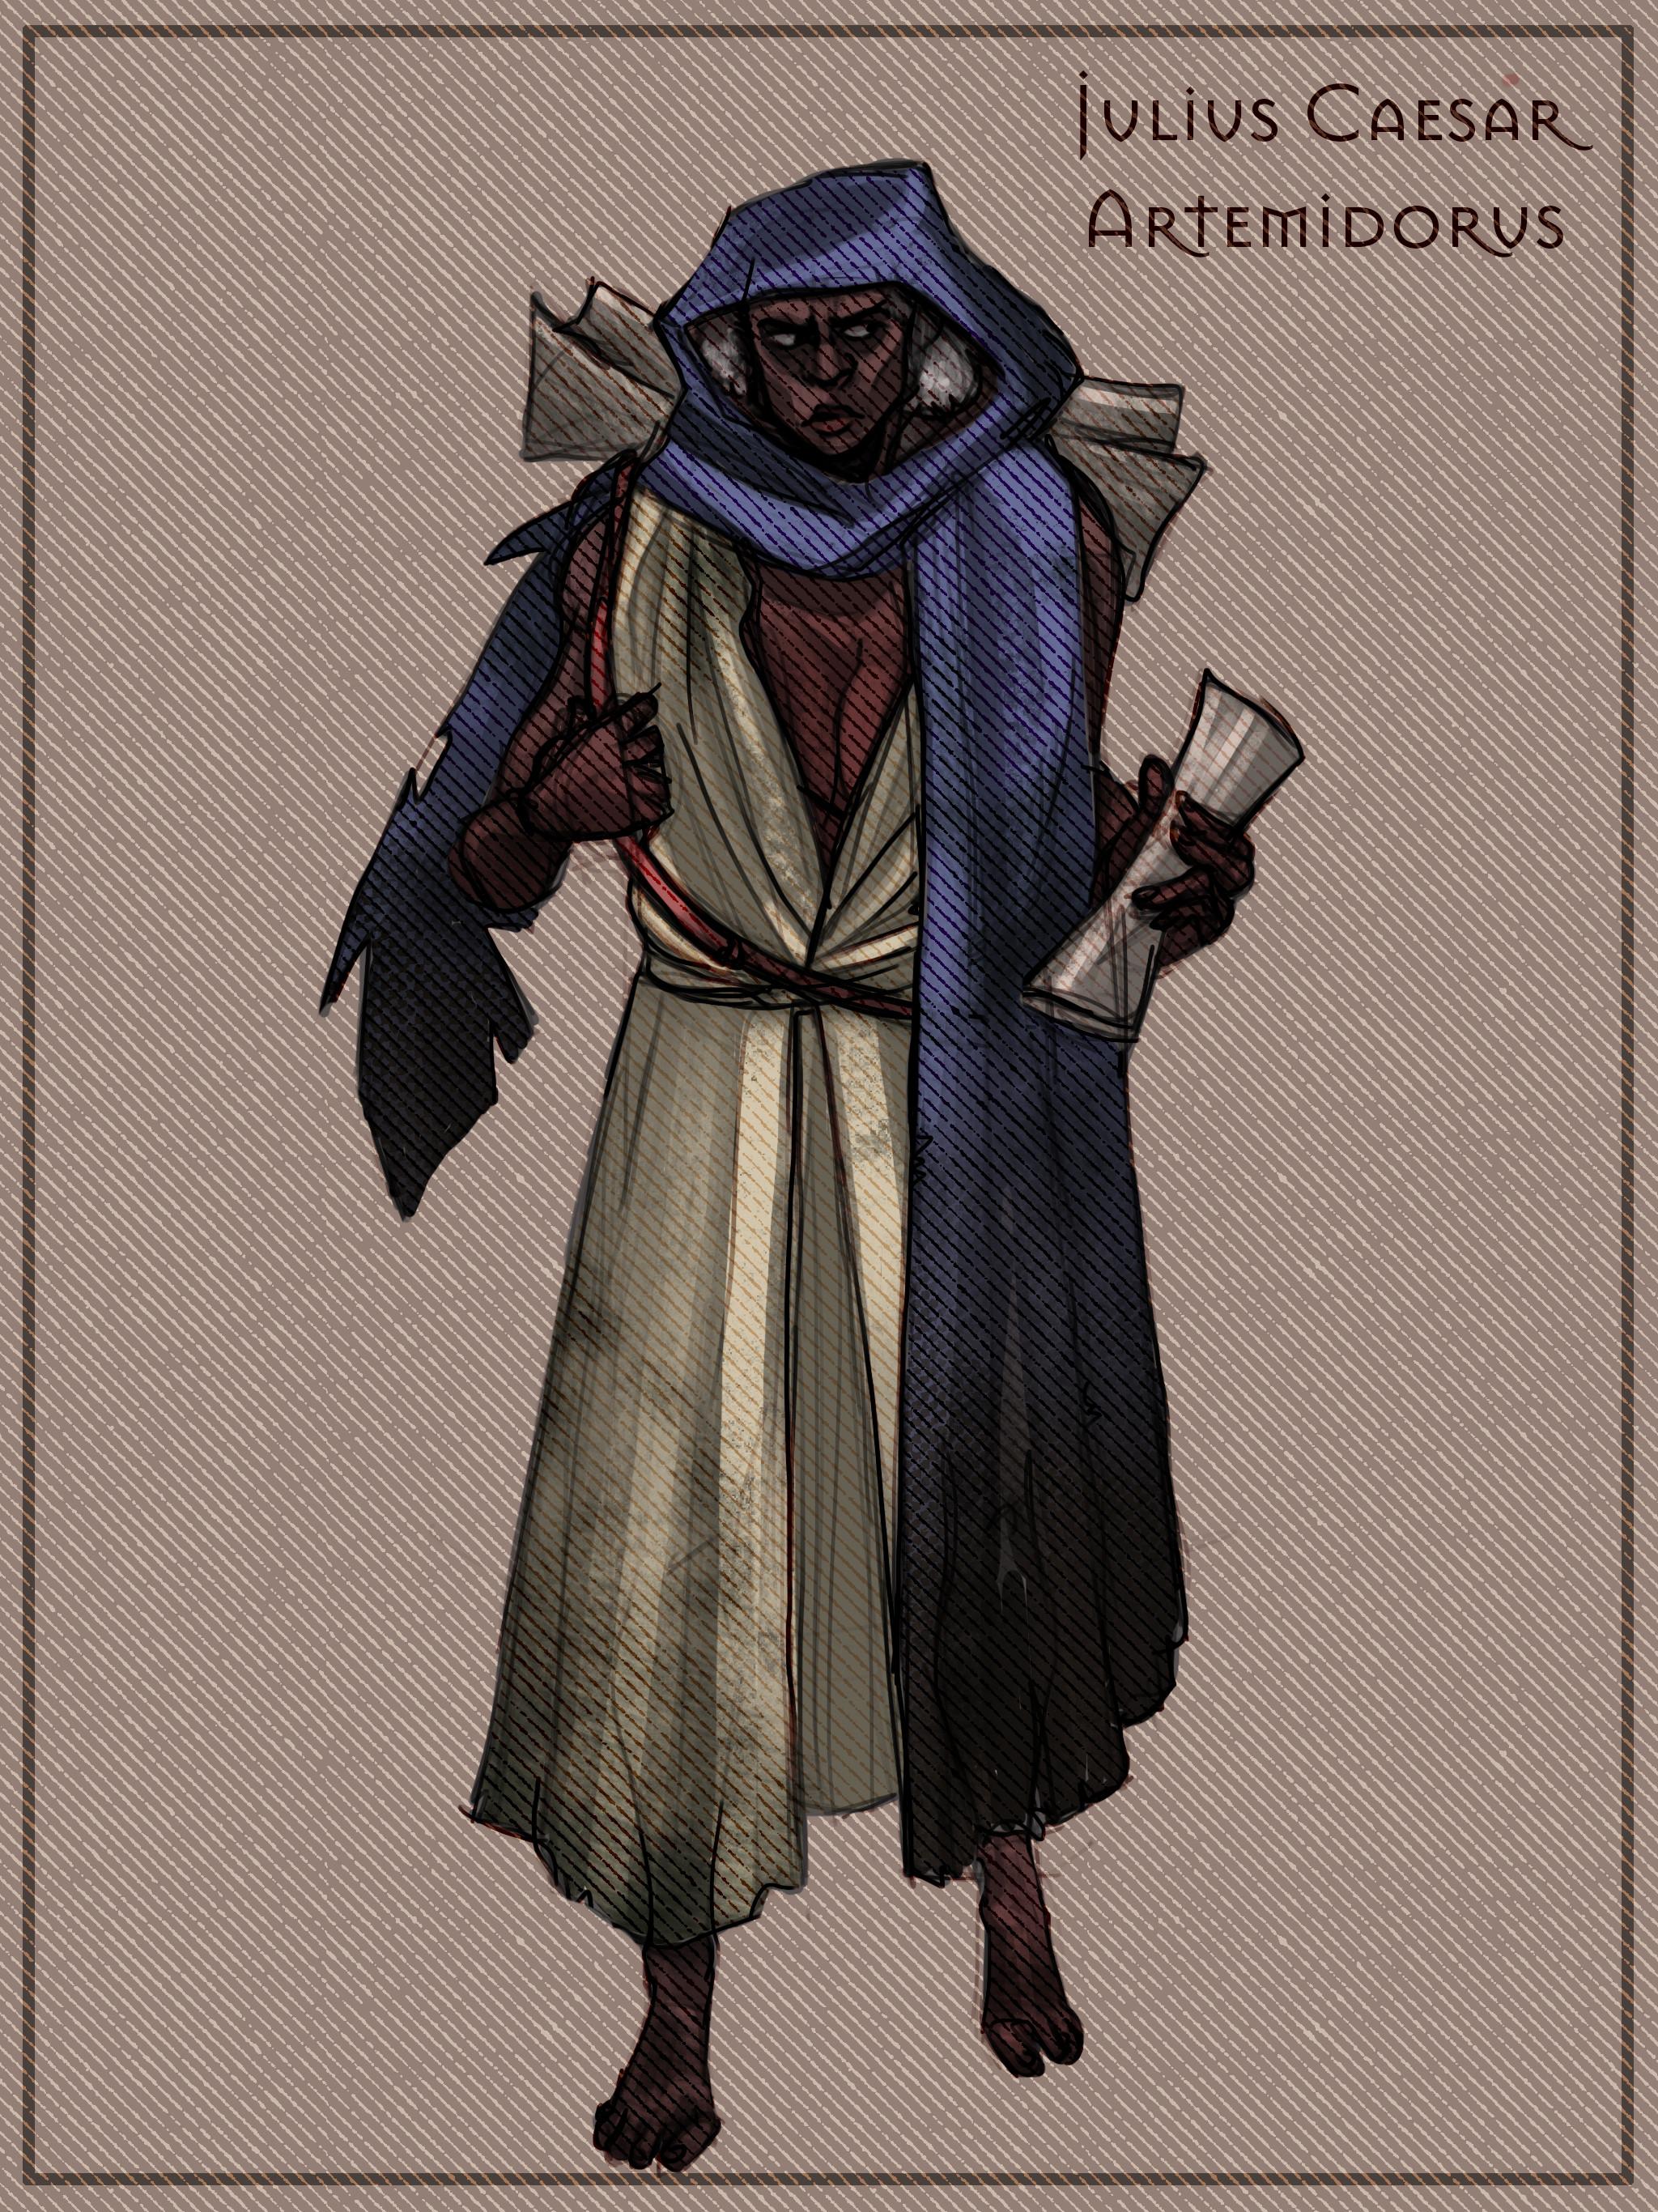 Artemidorus, the scholar